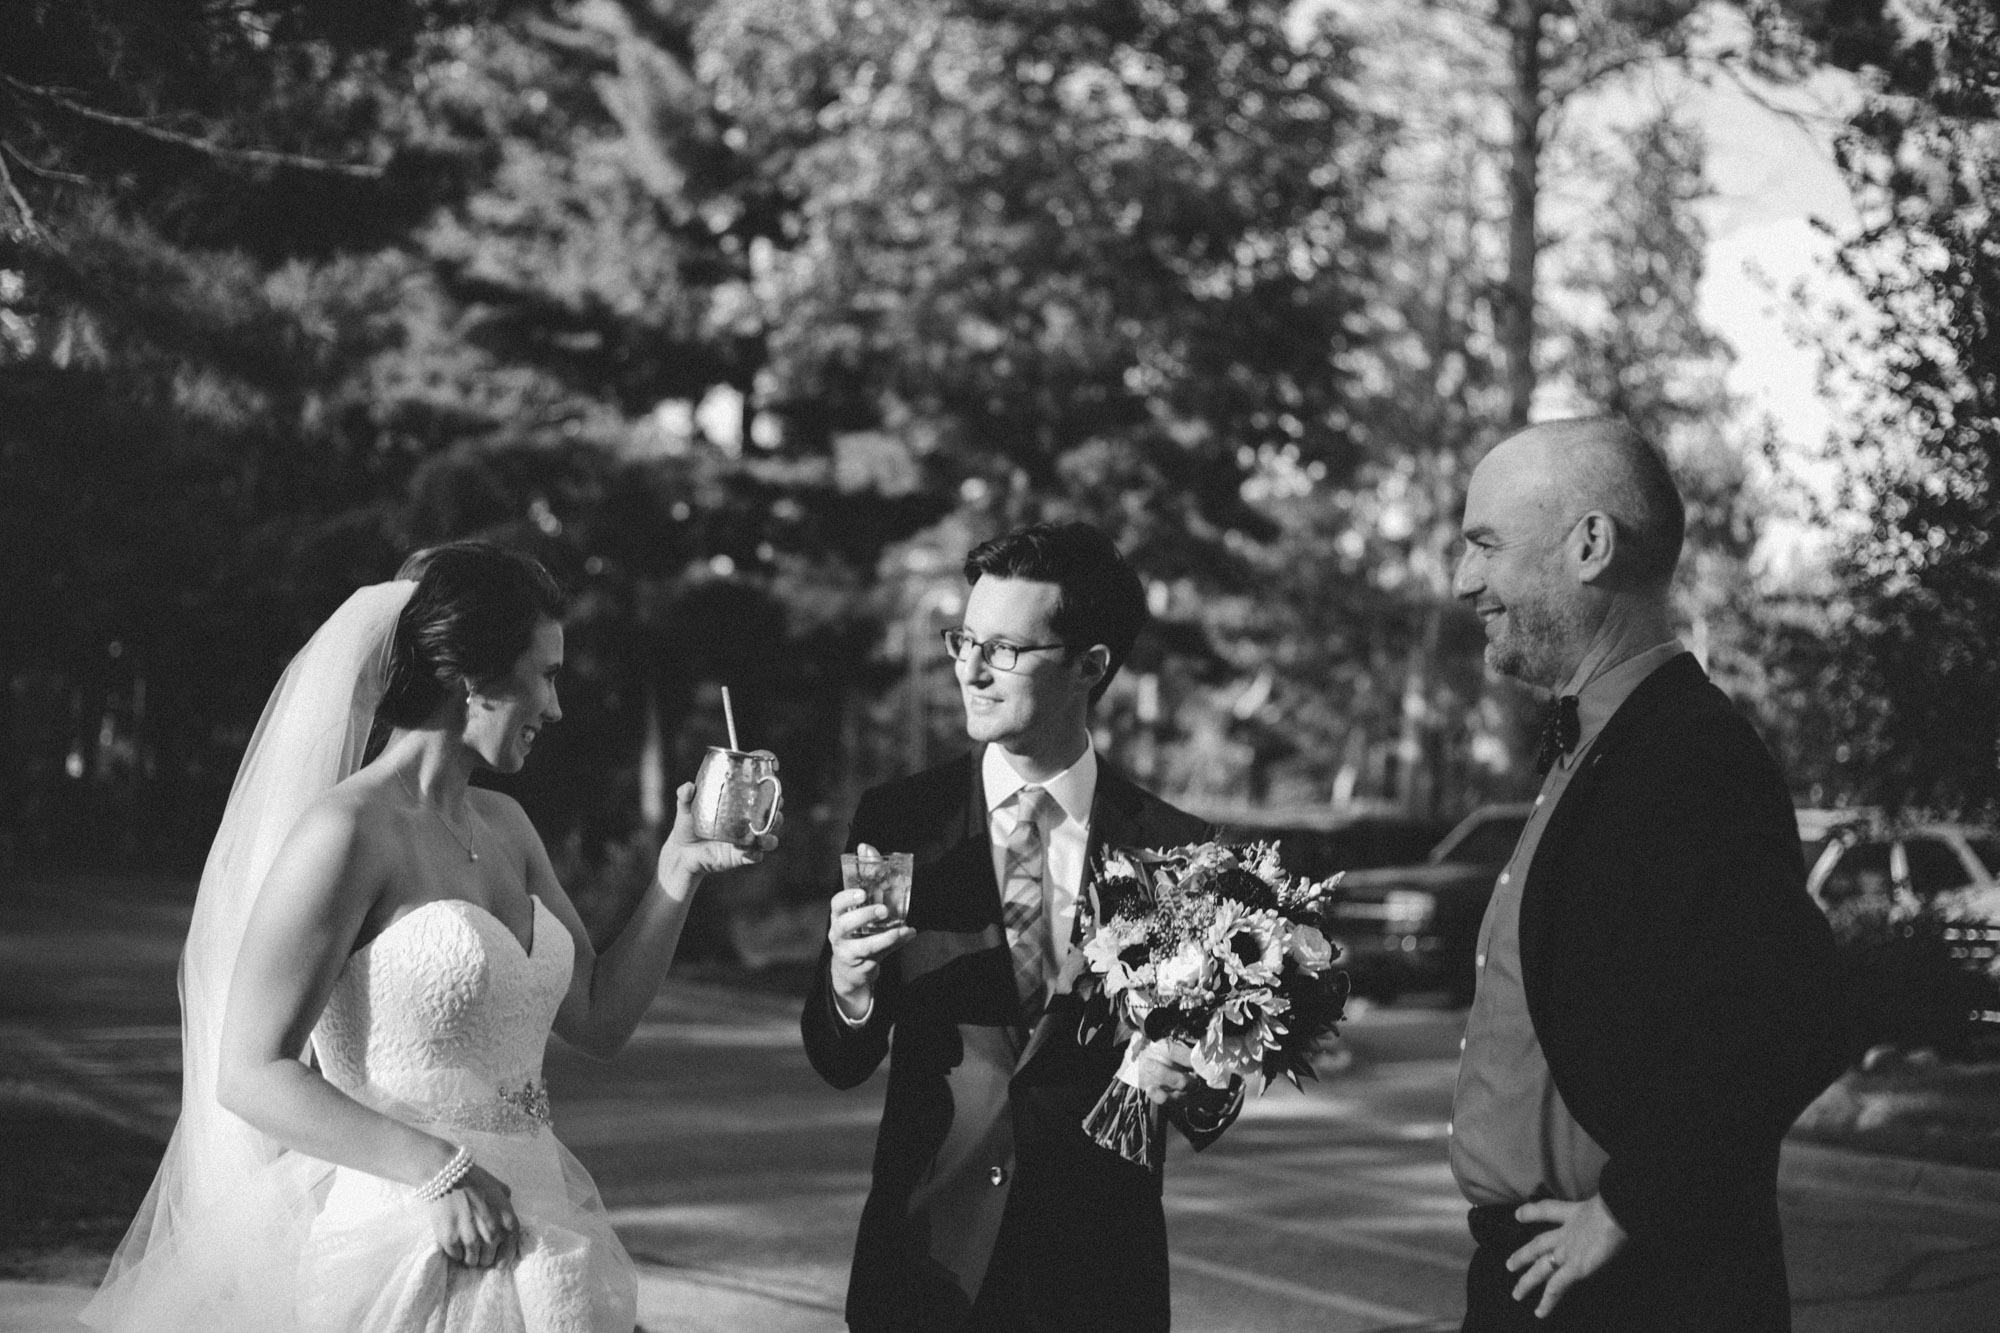 Mad Men inspired wedding at Grand View Lodge, photography by Britt DeZeeuw Brainerd Minnesota photographer